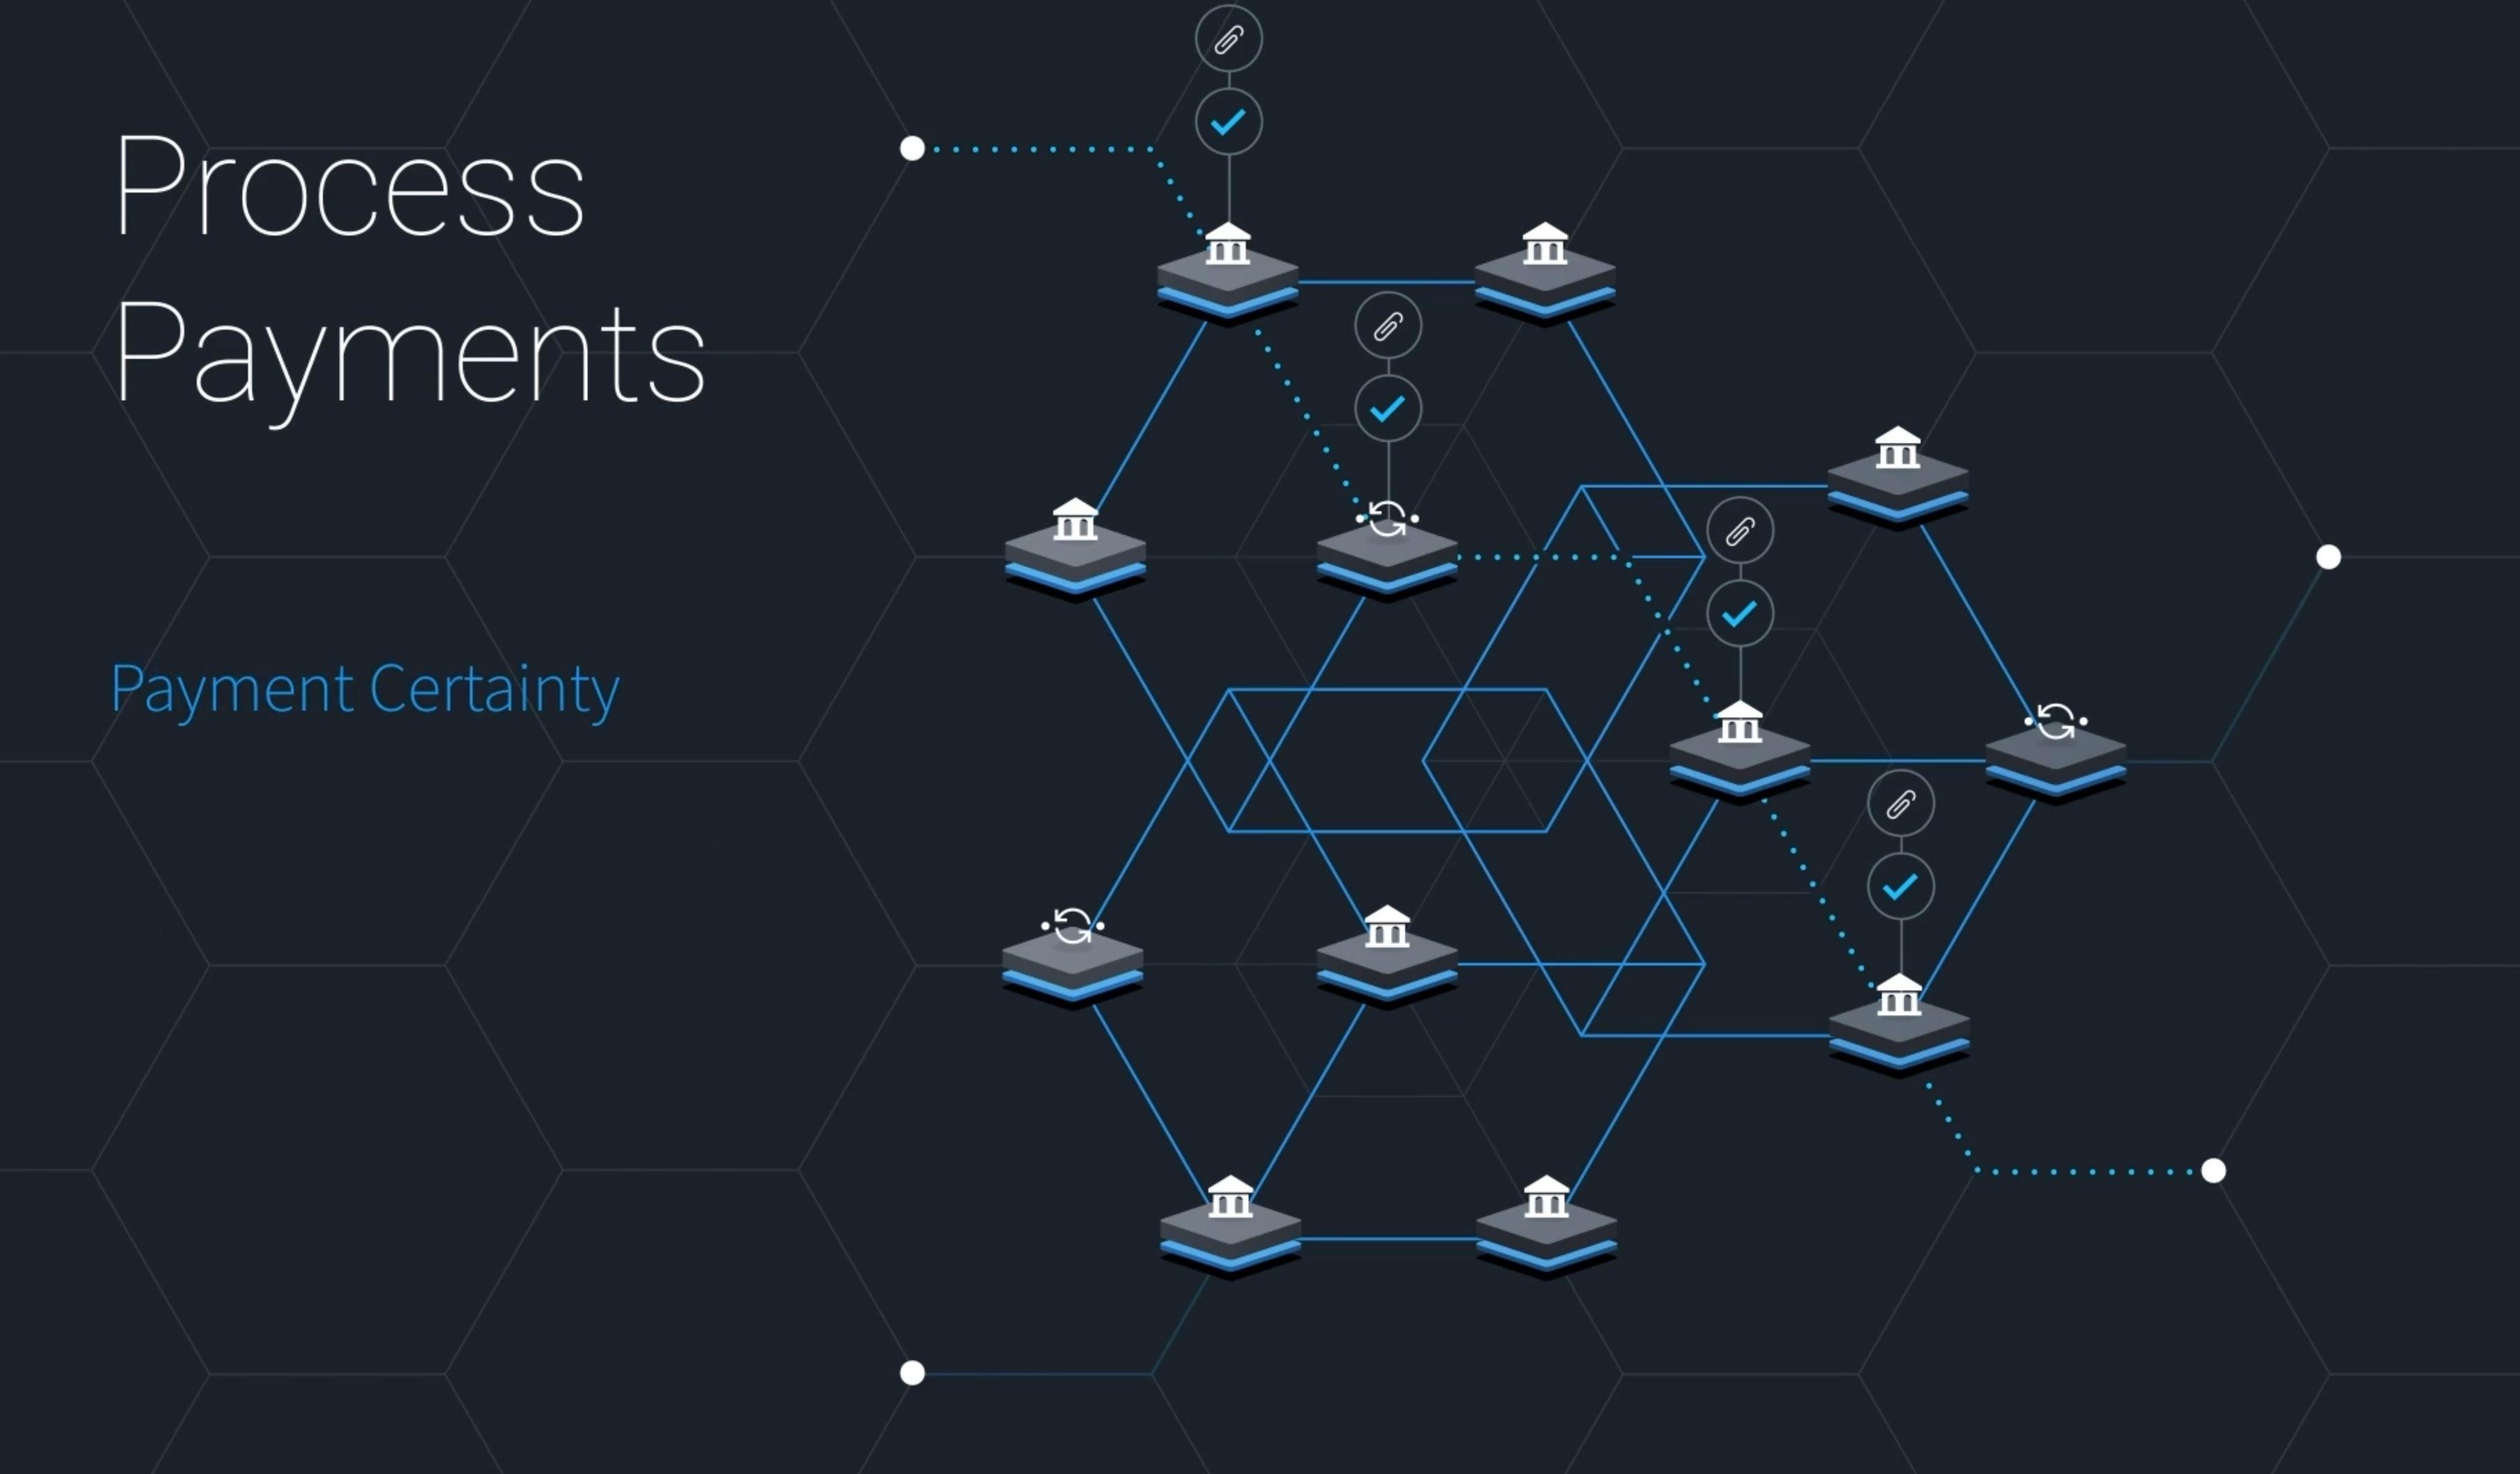 Ripple Funktionsweise des Ripple Netzwerks erklärt